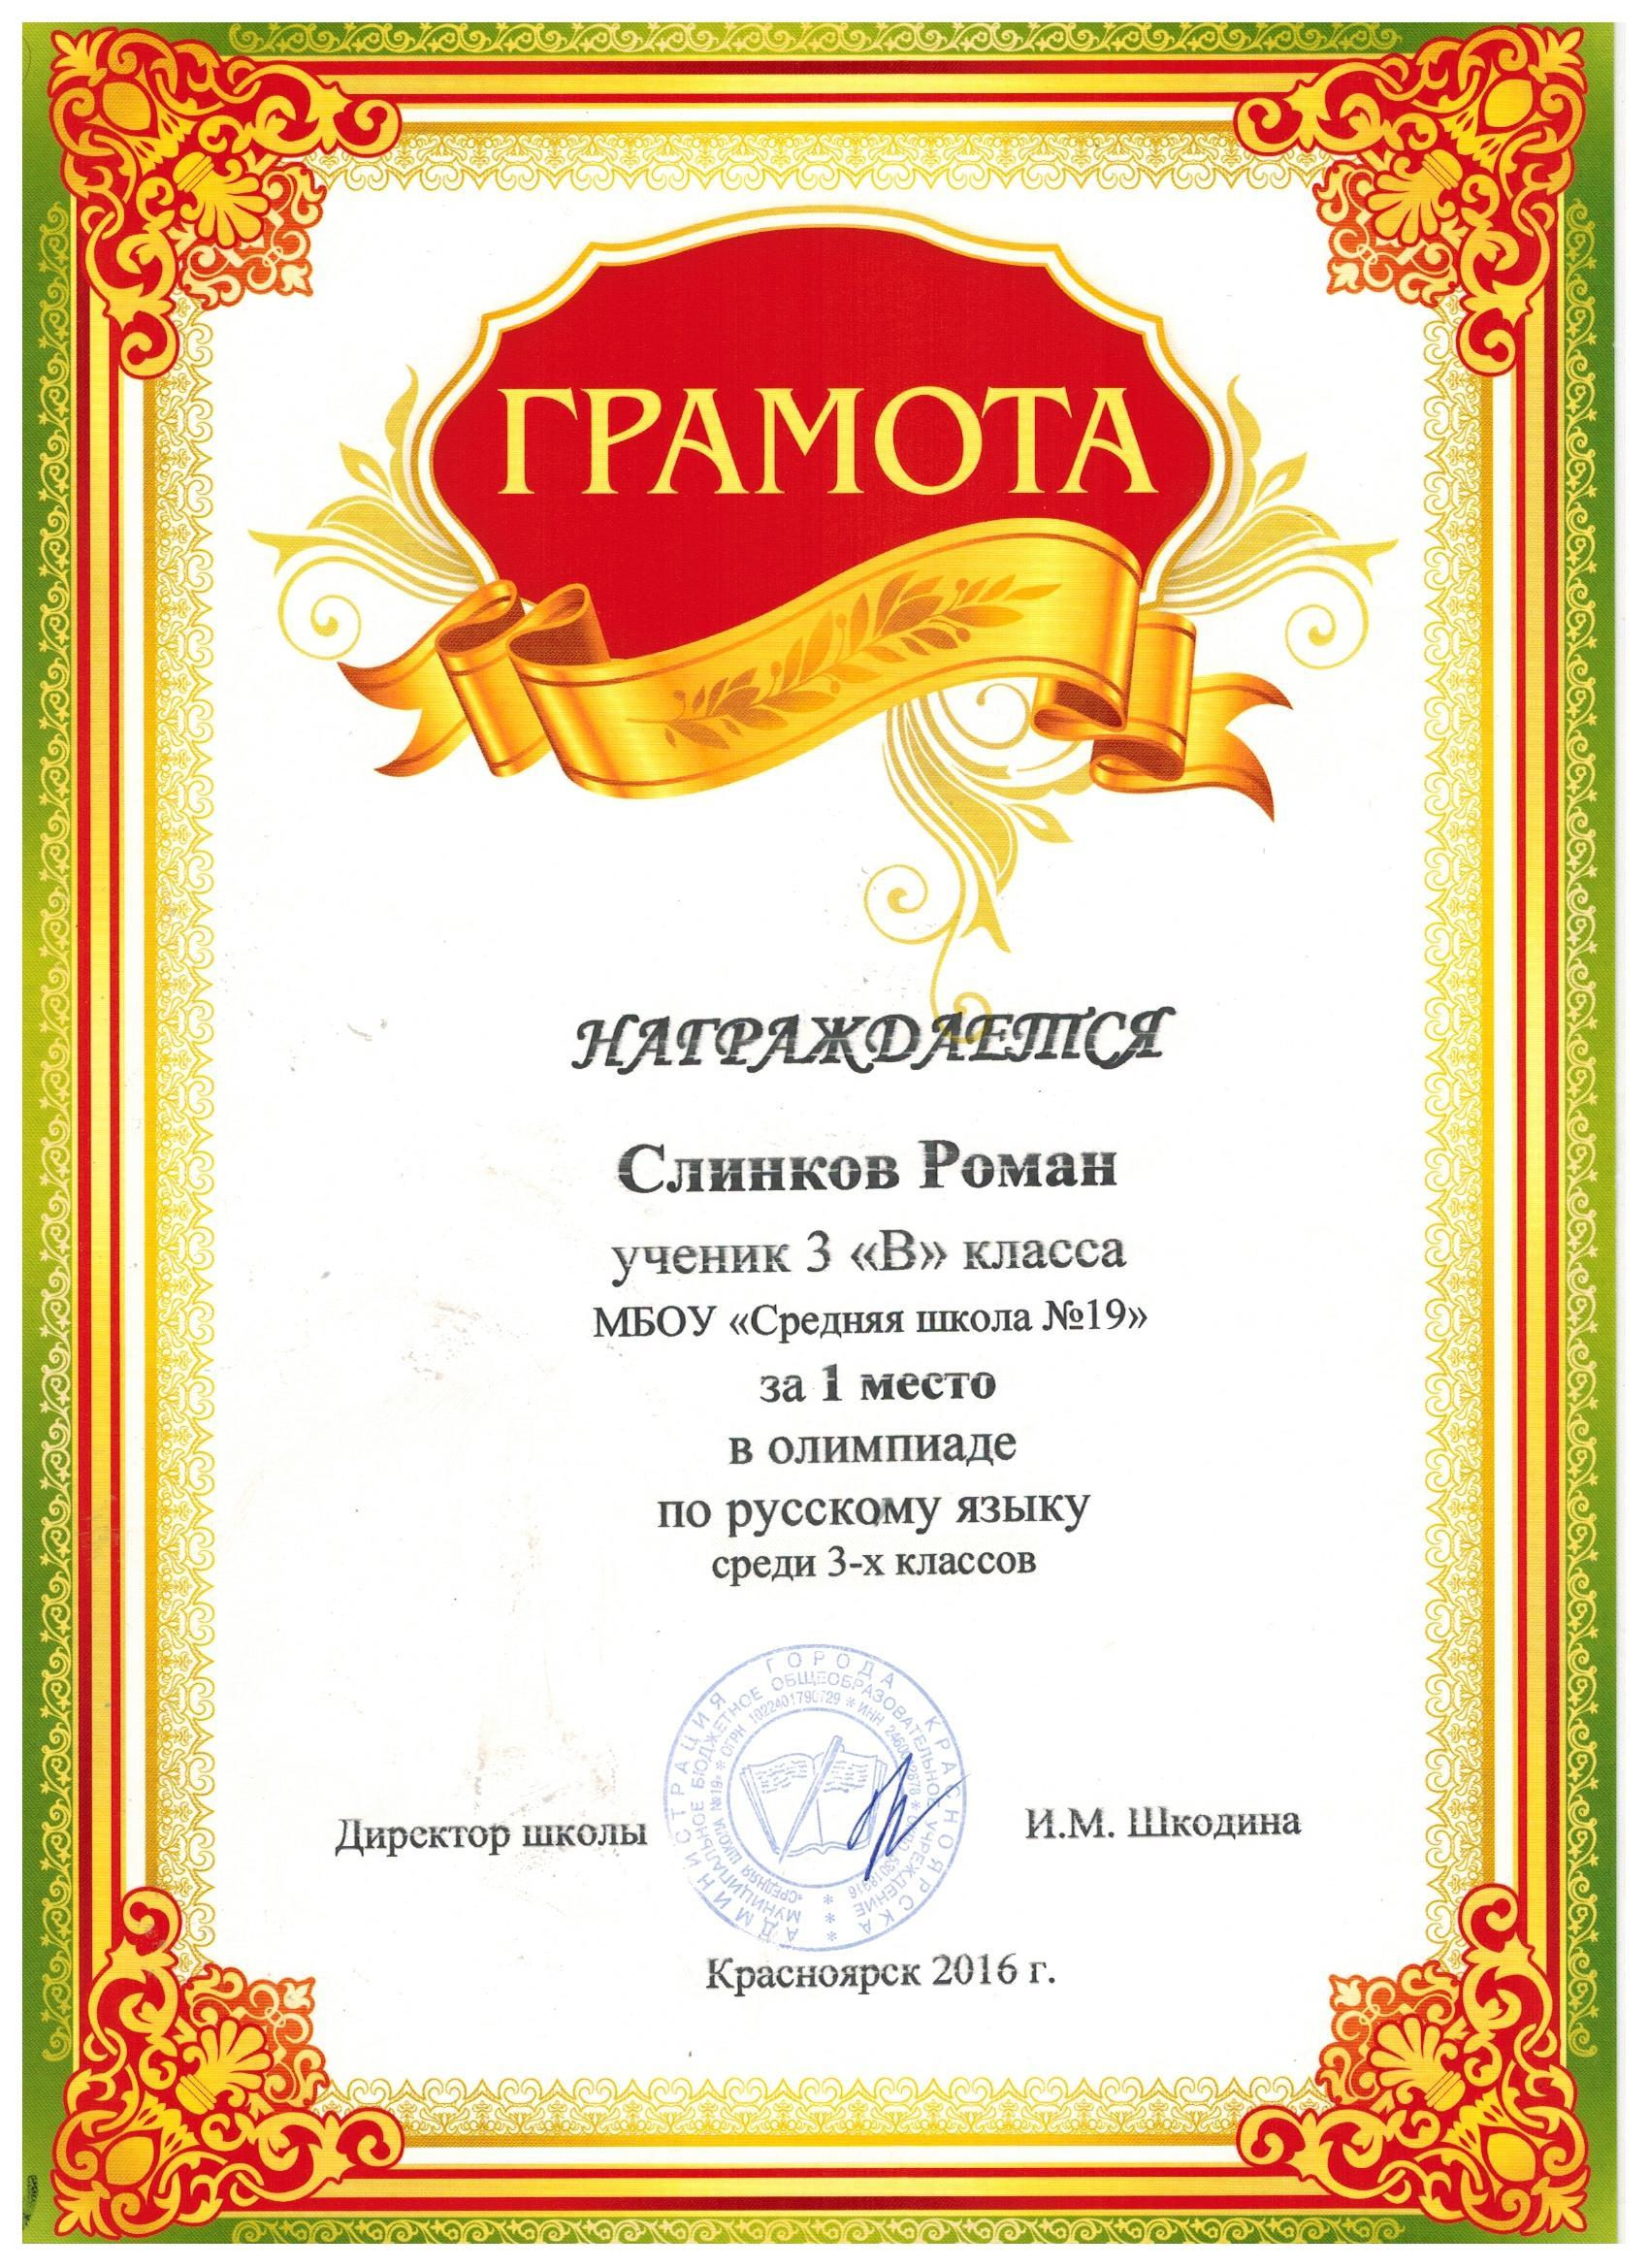 Шедько Елена Юрьевна Слинков Р Грамота за 1 место в олимпиаде по русскому языку 2016 год